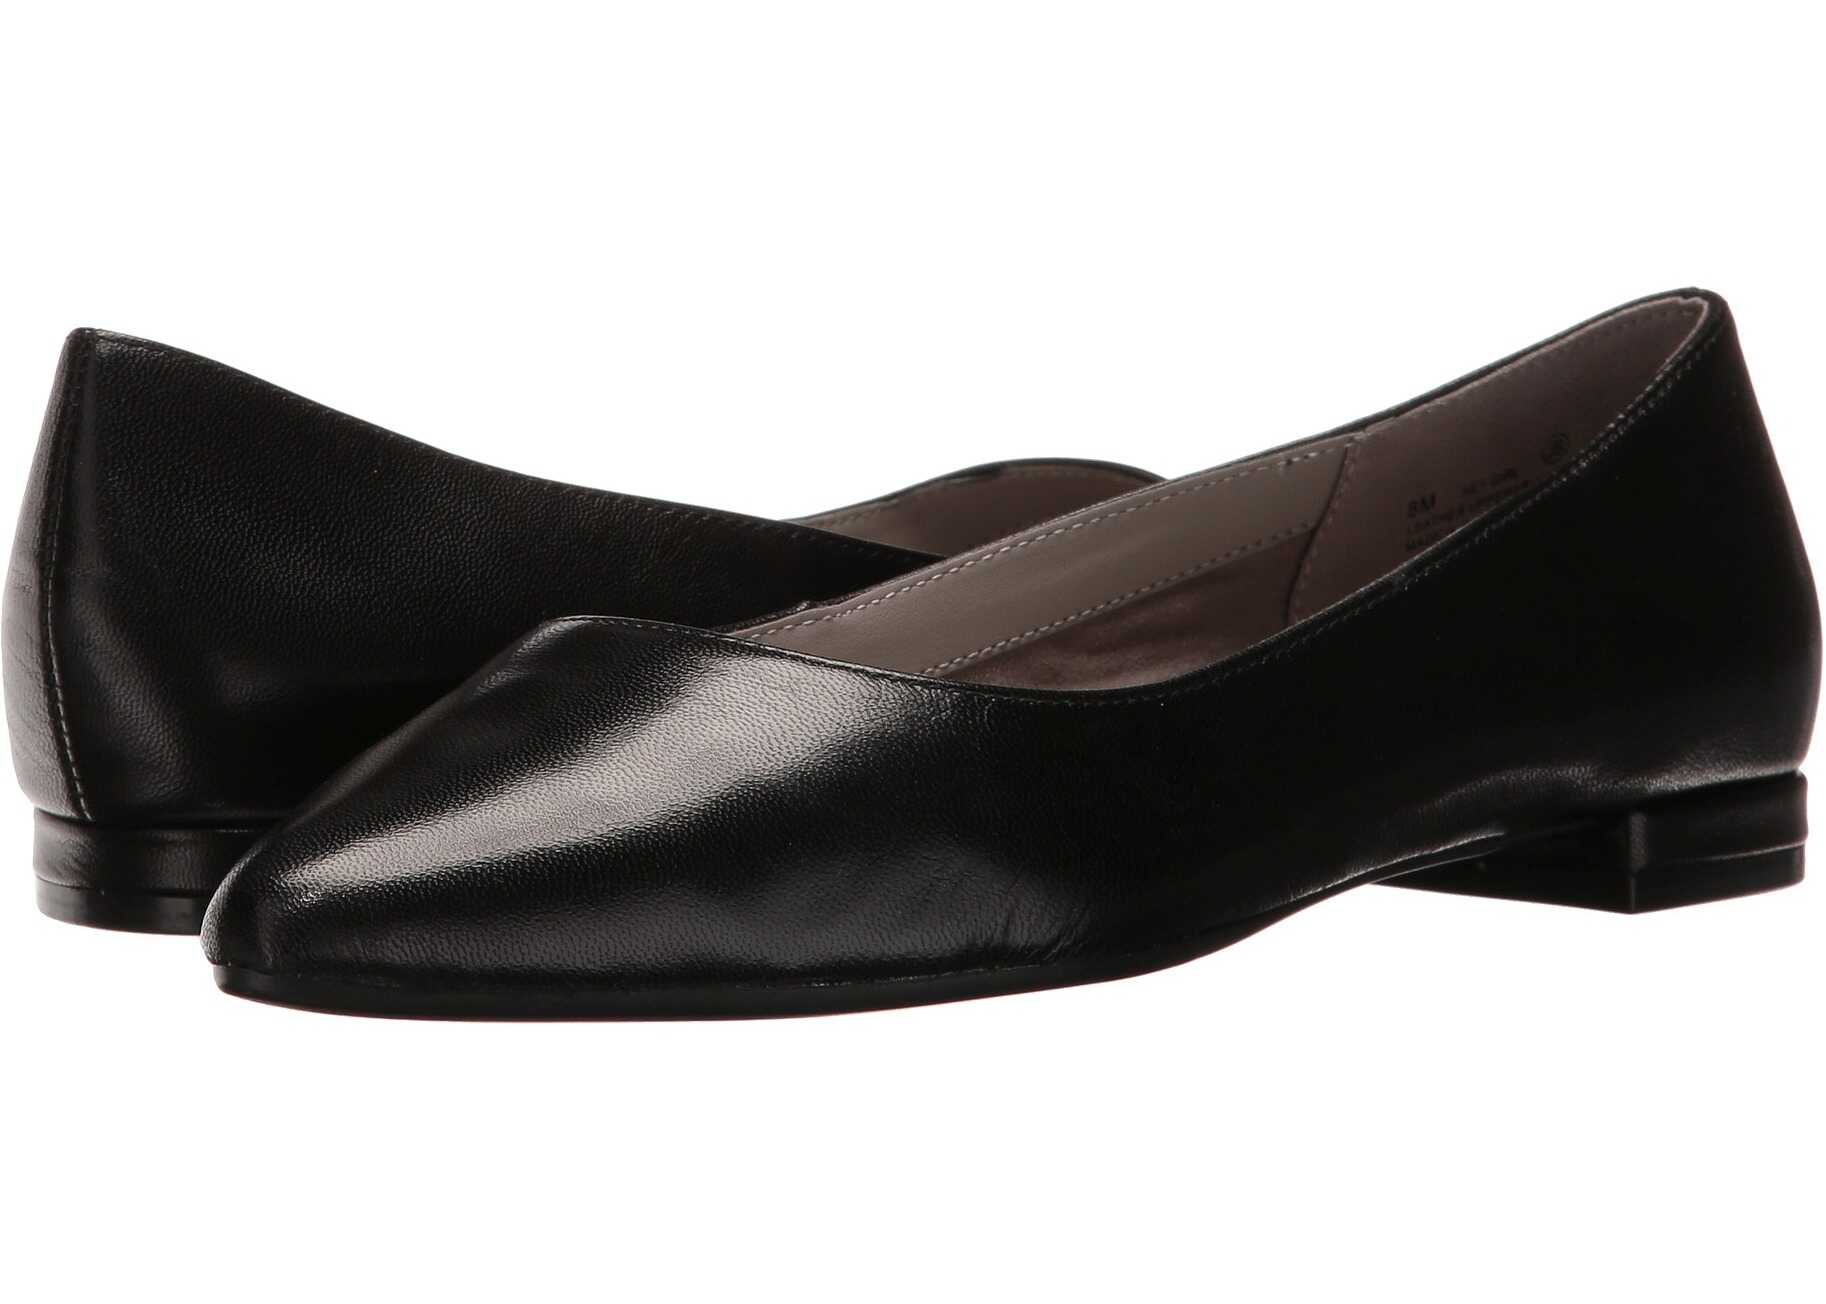 Aerosoles Hey Girl Black Leather